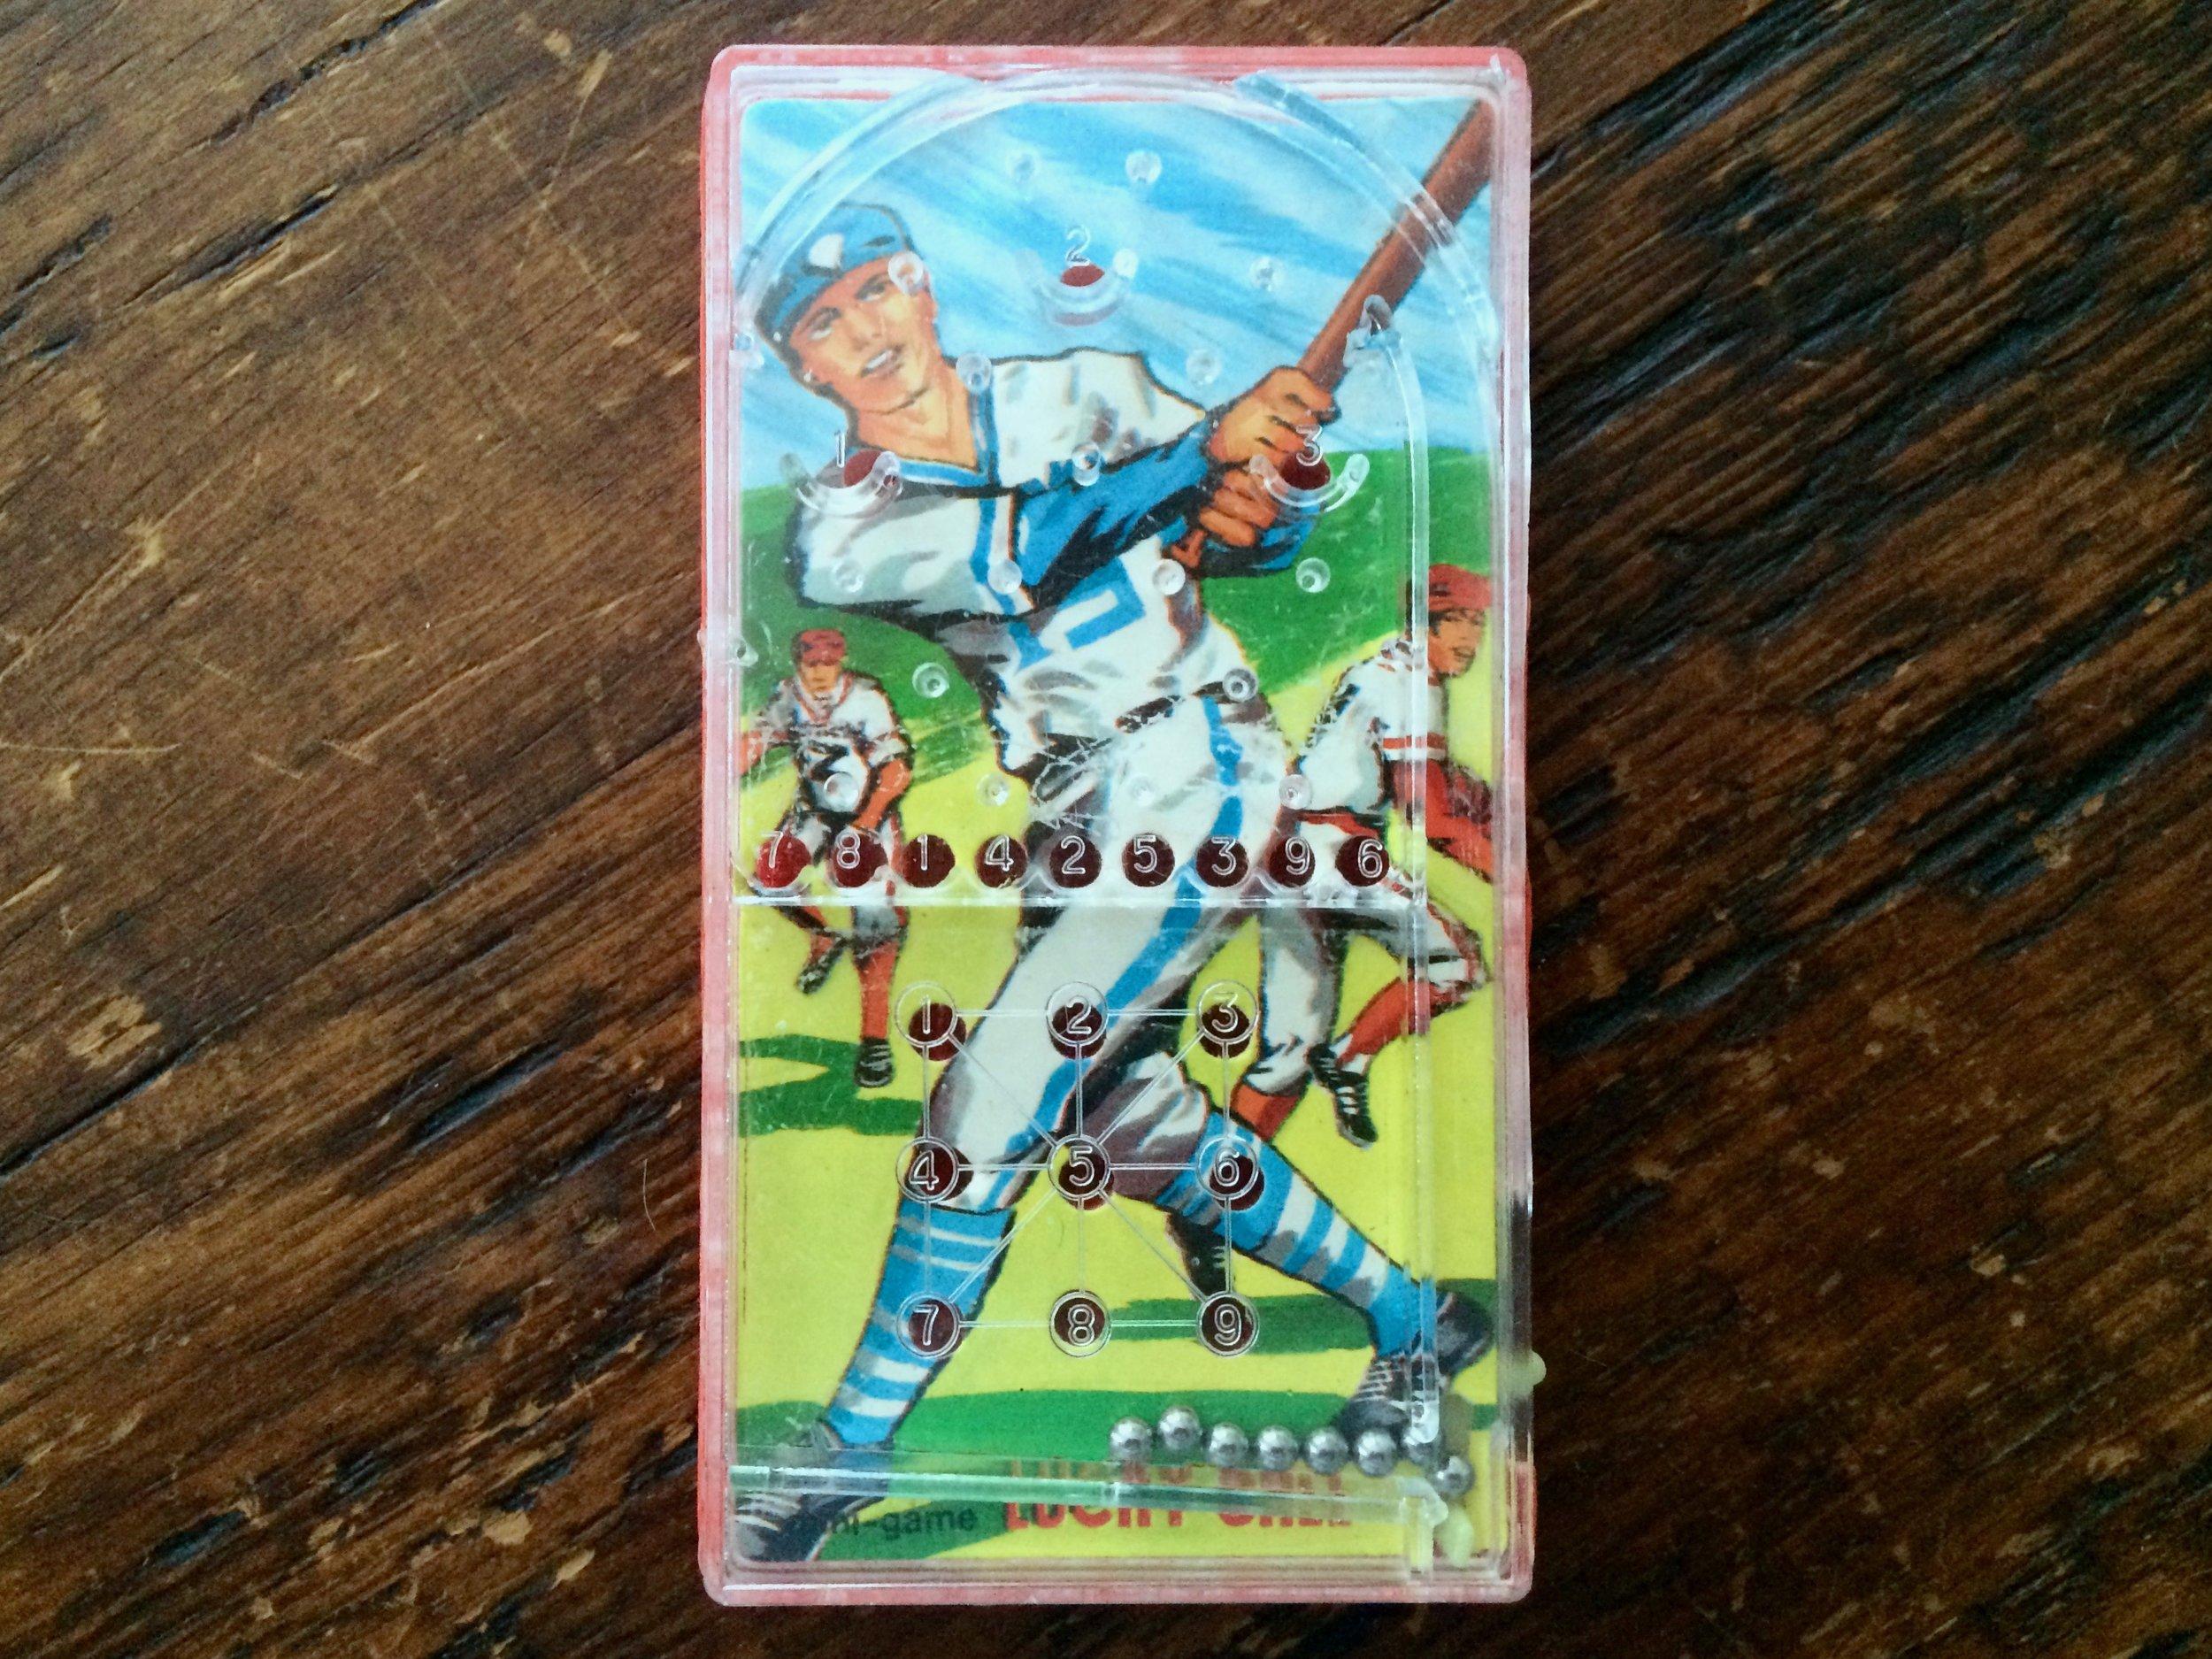 Baseball Mini Pinball Game